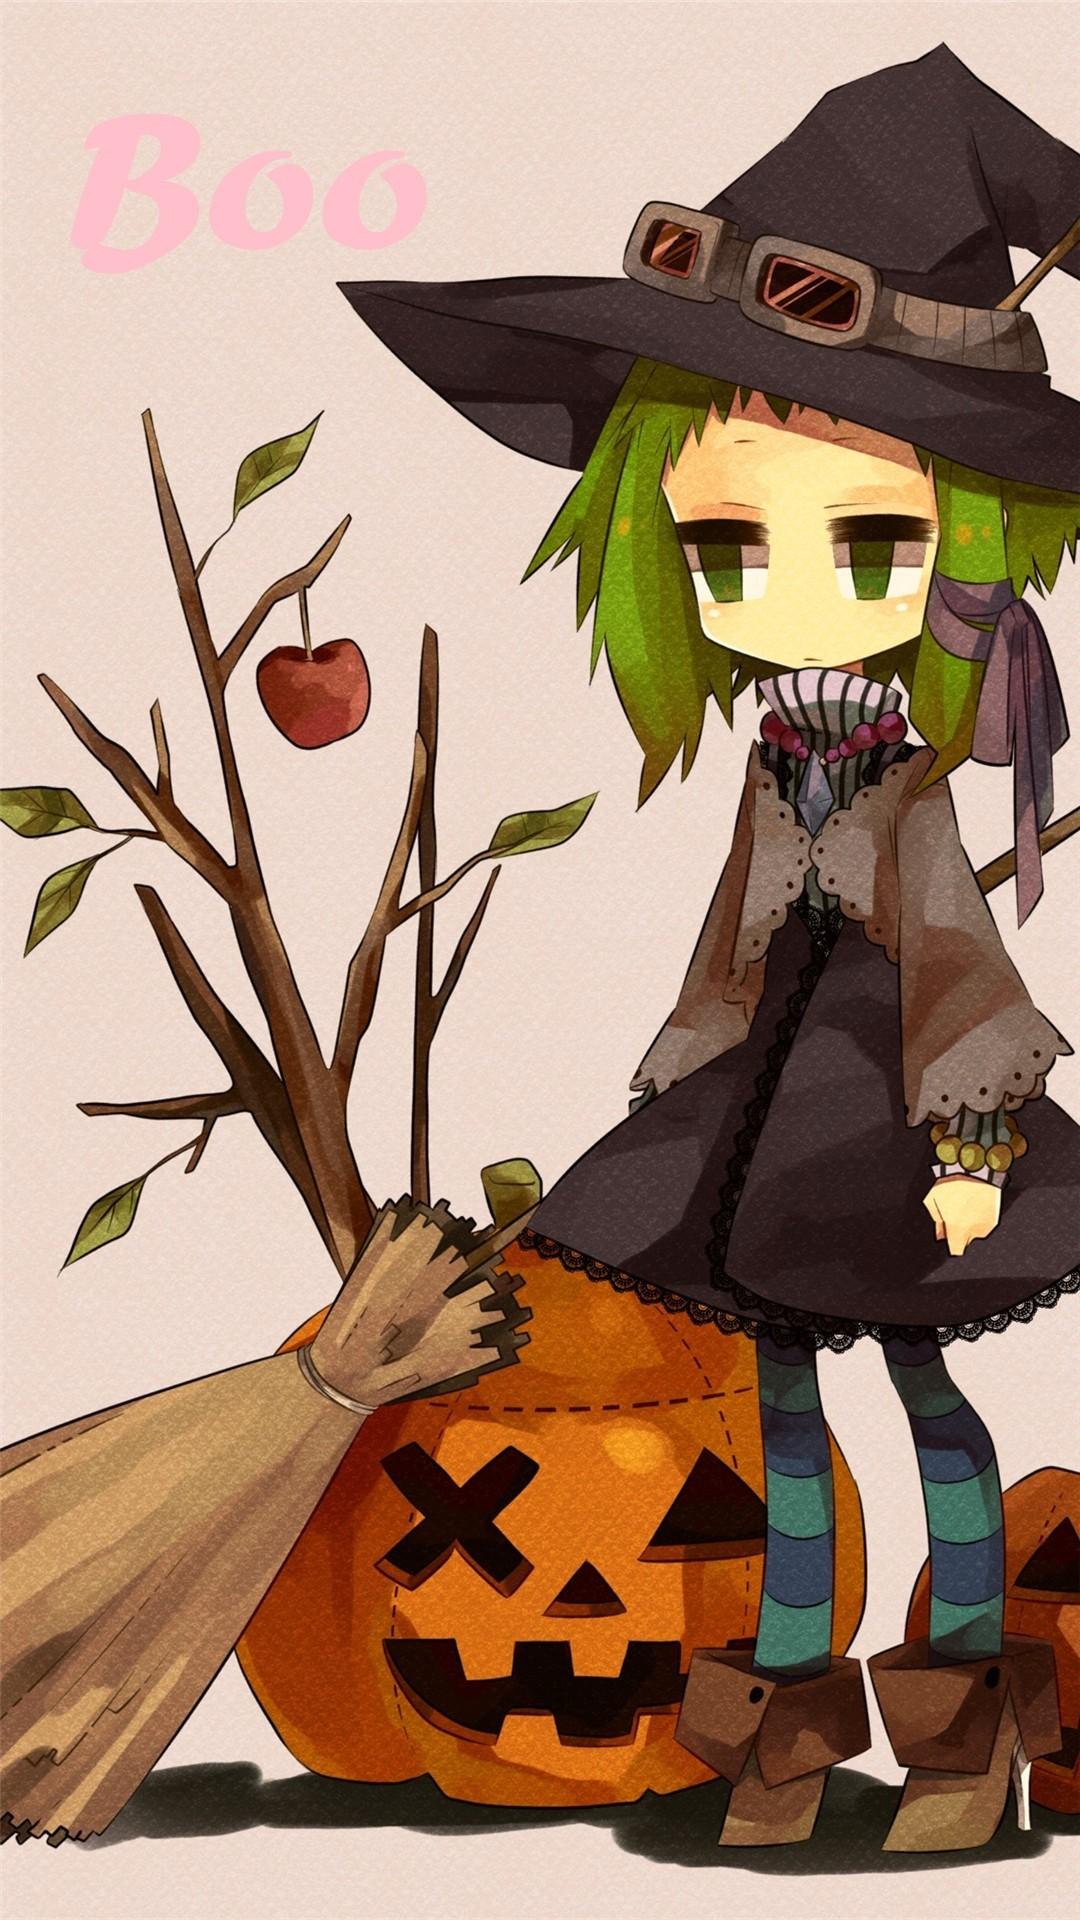 Anime Halloween Wallpaper Backgrounds : anime, halloween, wallpaper, backgrounds, Halloween, Iphone, Wallpapers, Anime, Backgrounds, 1080x1920, Wallpaper, Teahub.io